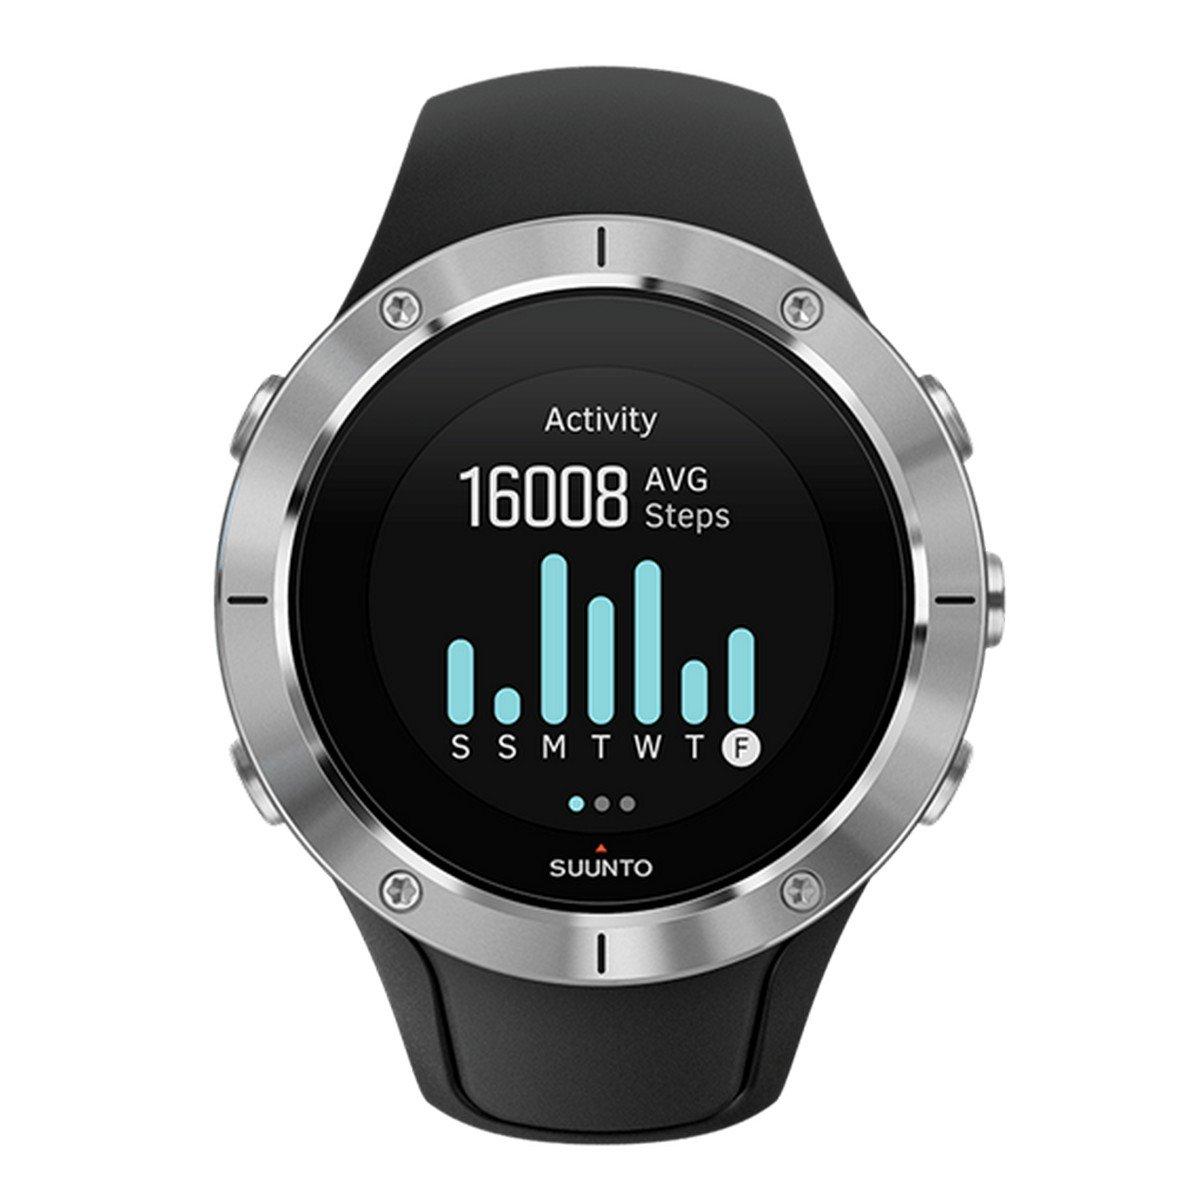 Amazon.com: Suunto Spartan Trainer Wrist HR Multisport GPS Watch (Steel): GPS & Navigation